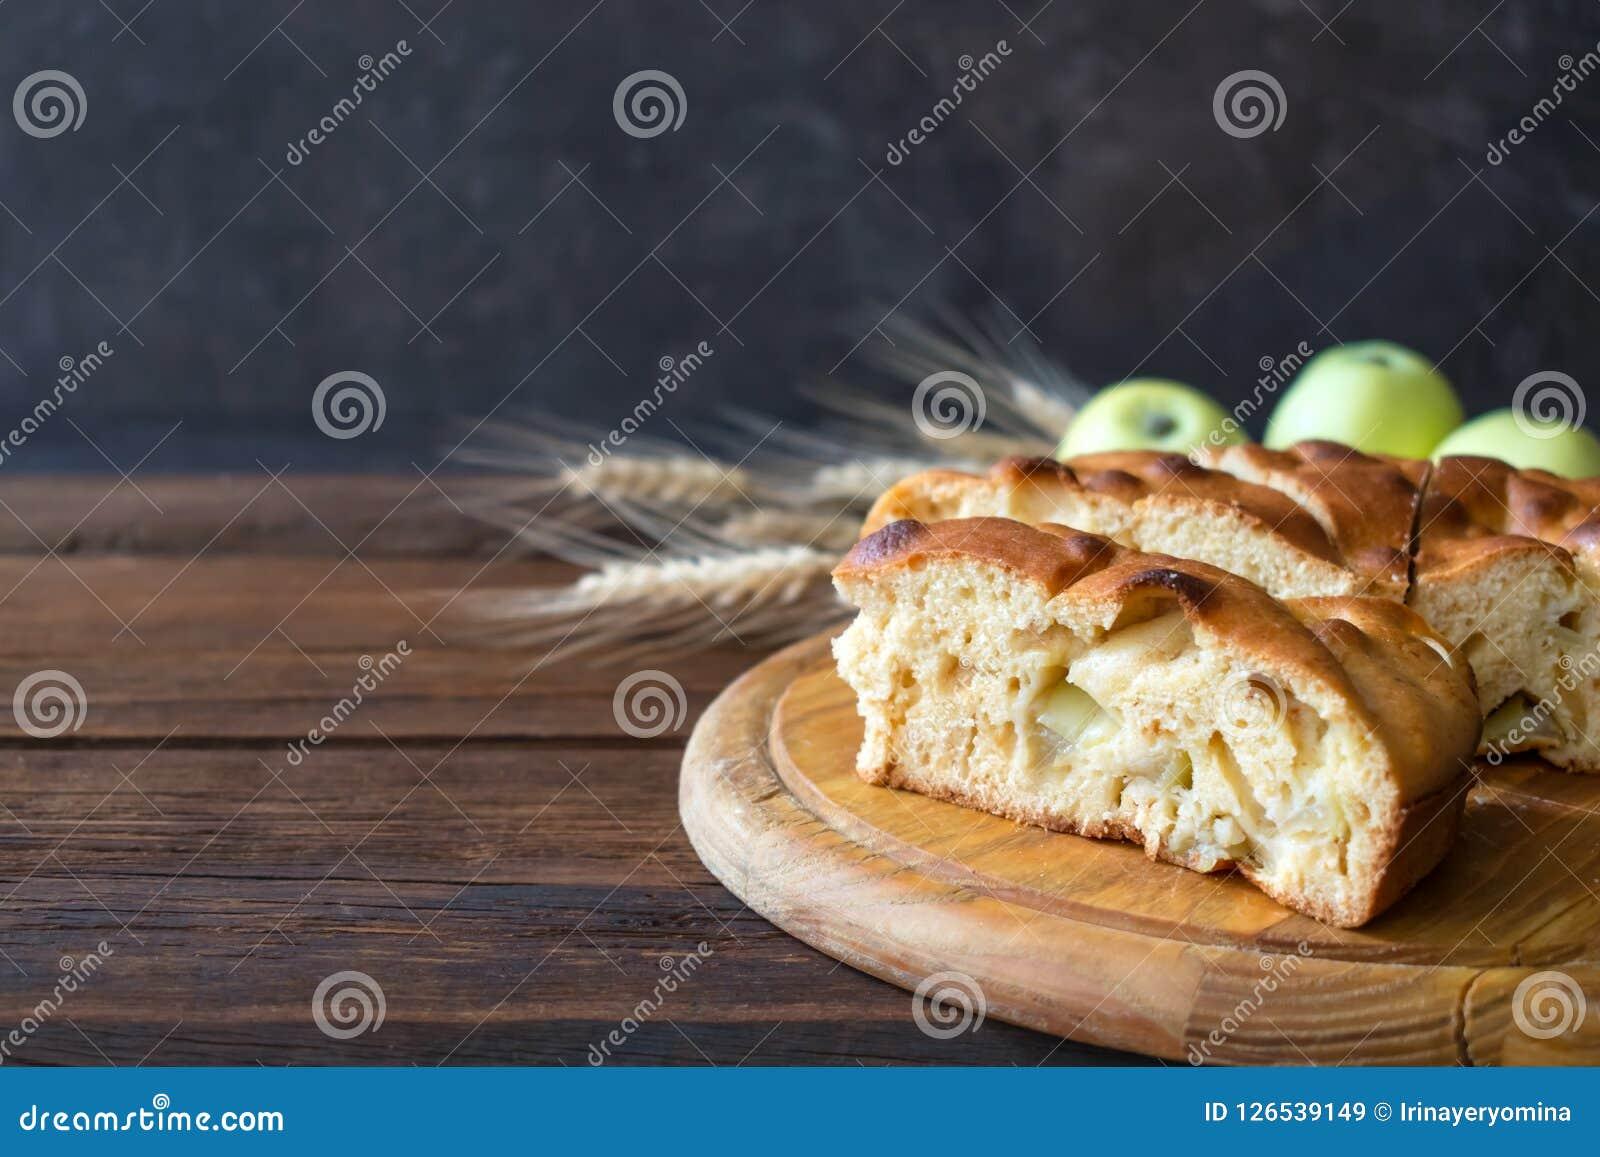 Torta di mele casalinga rotonda, calzolaio, budino di mele, Apple Charlotte